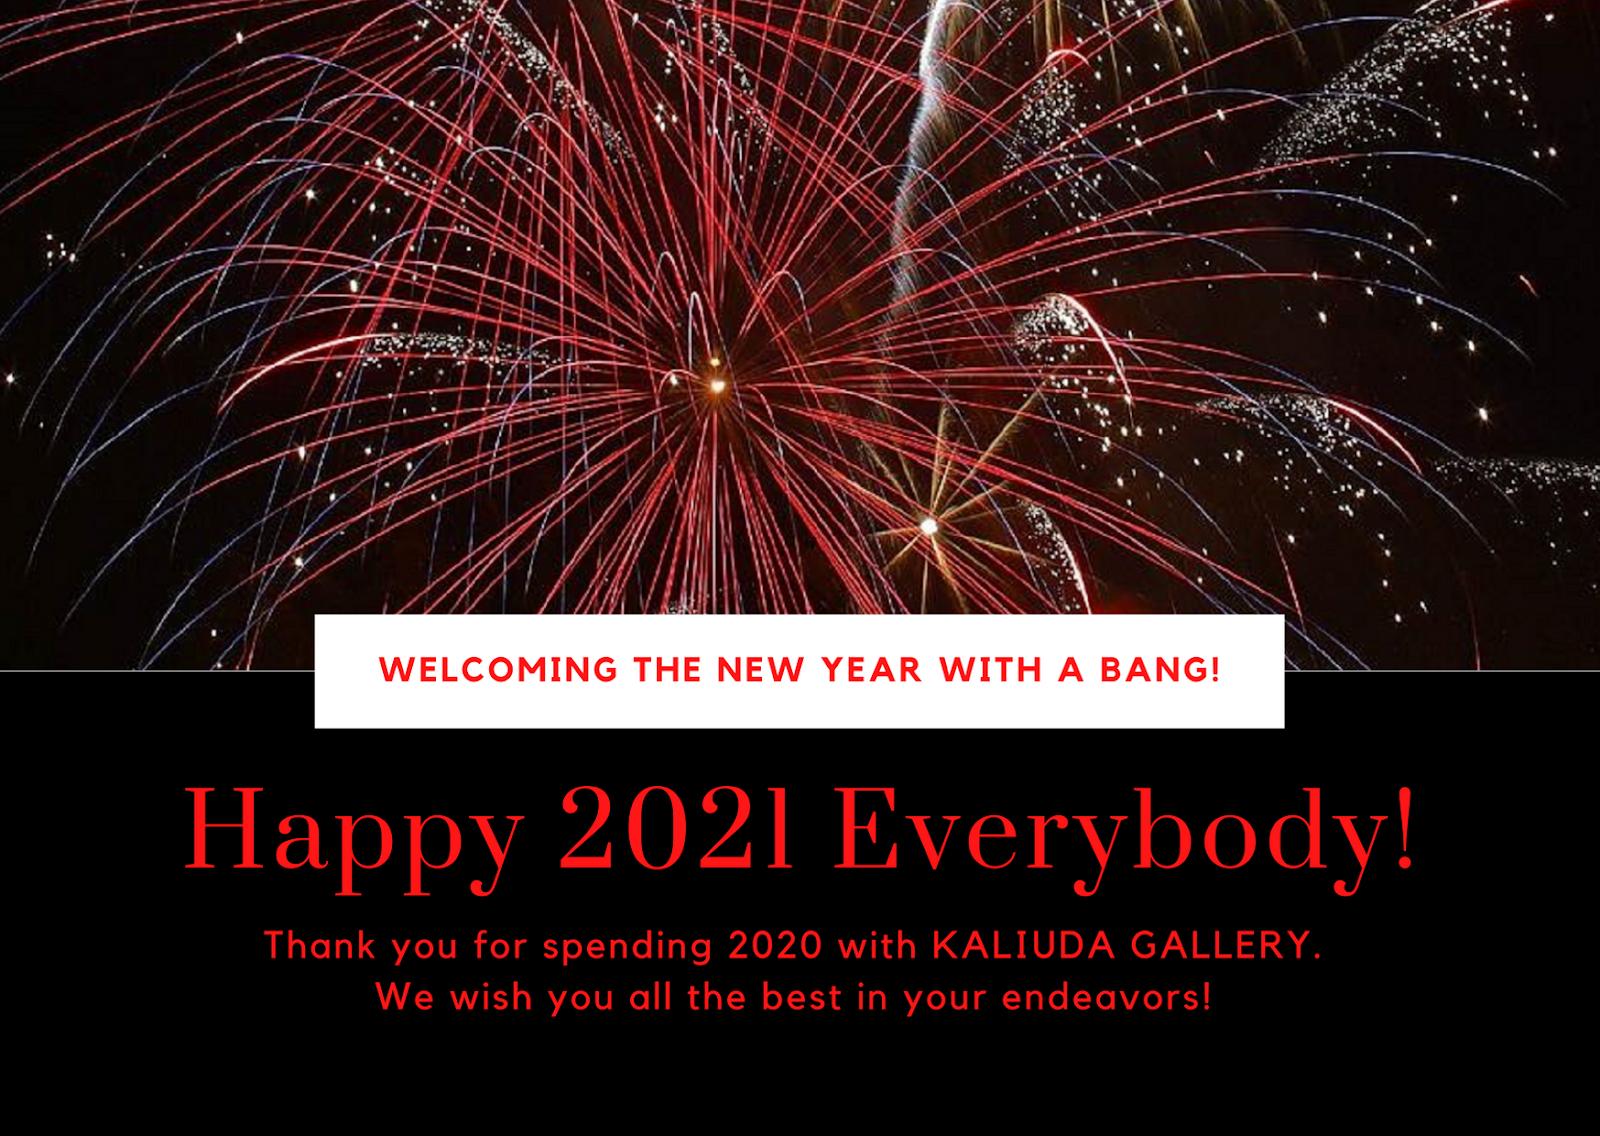 Happy New Year 2021 Love, Kaliuda Gallery Bali & Team